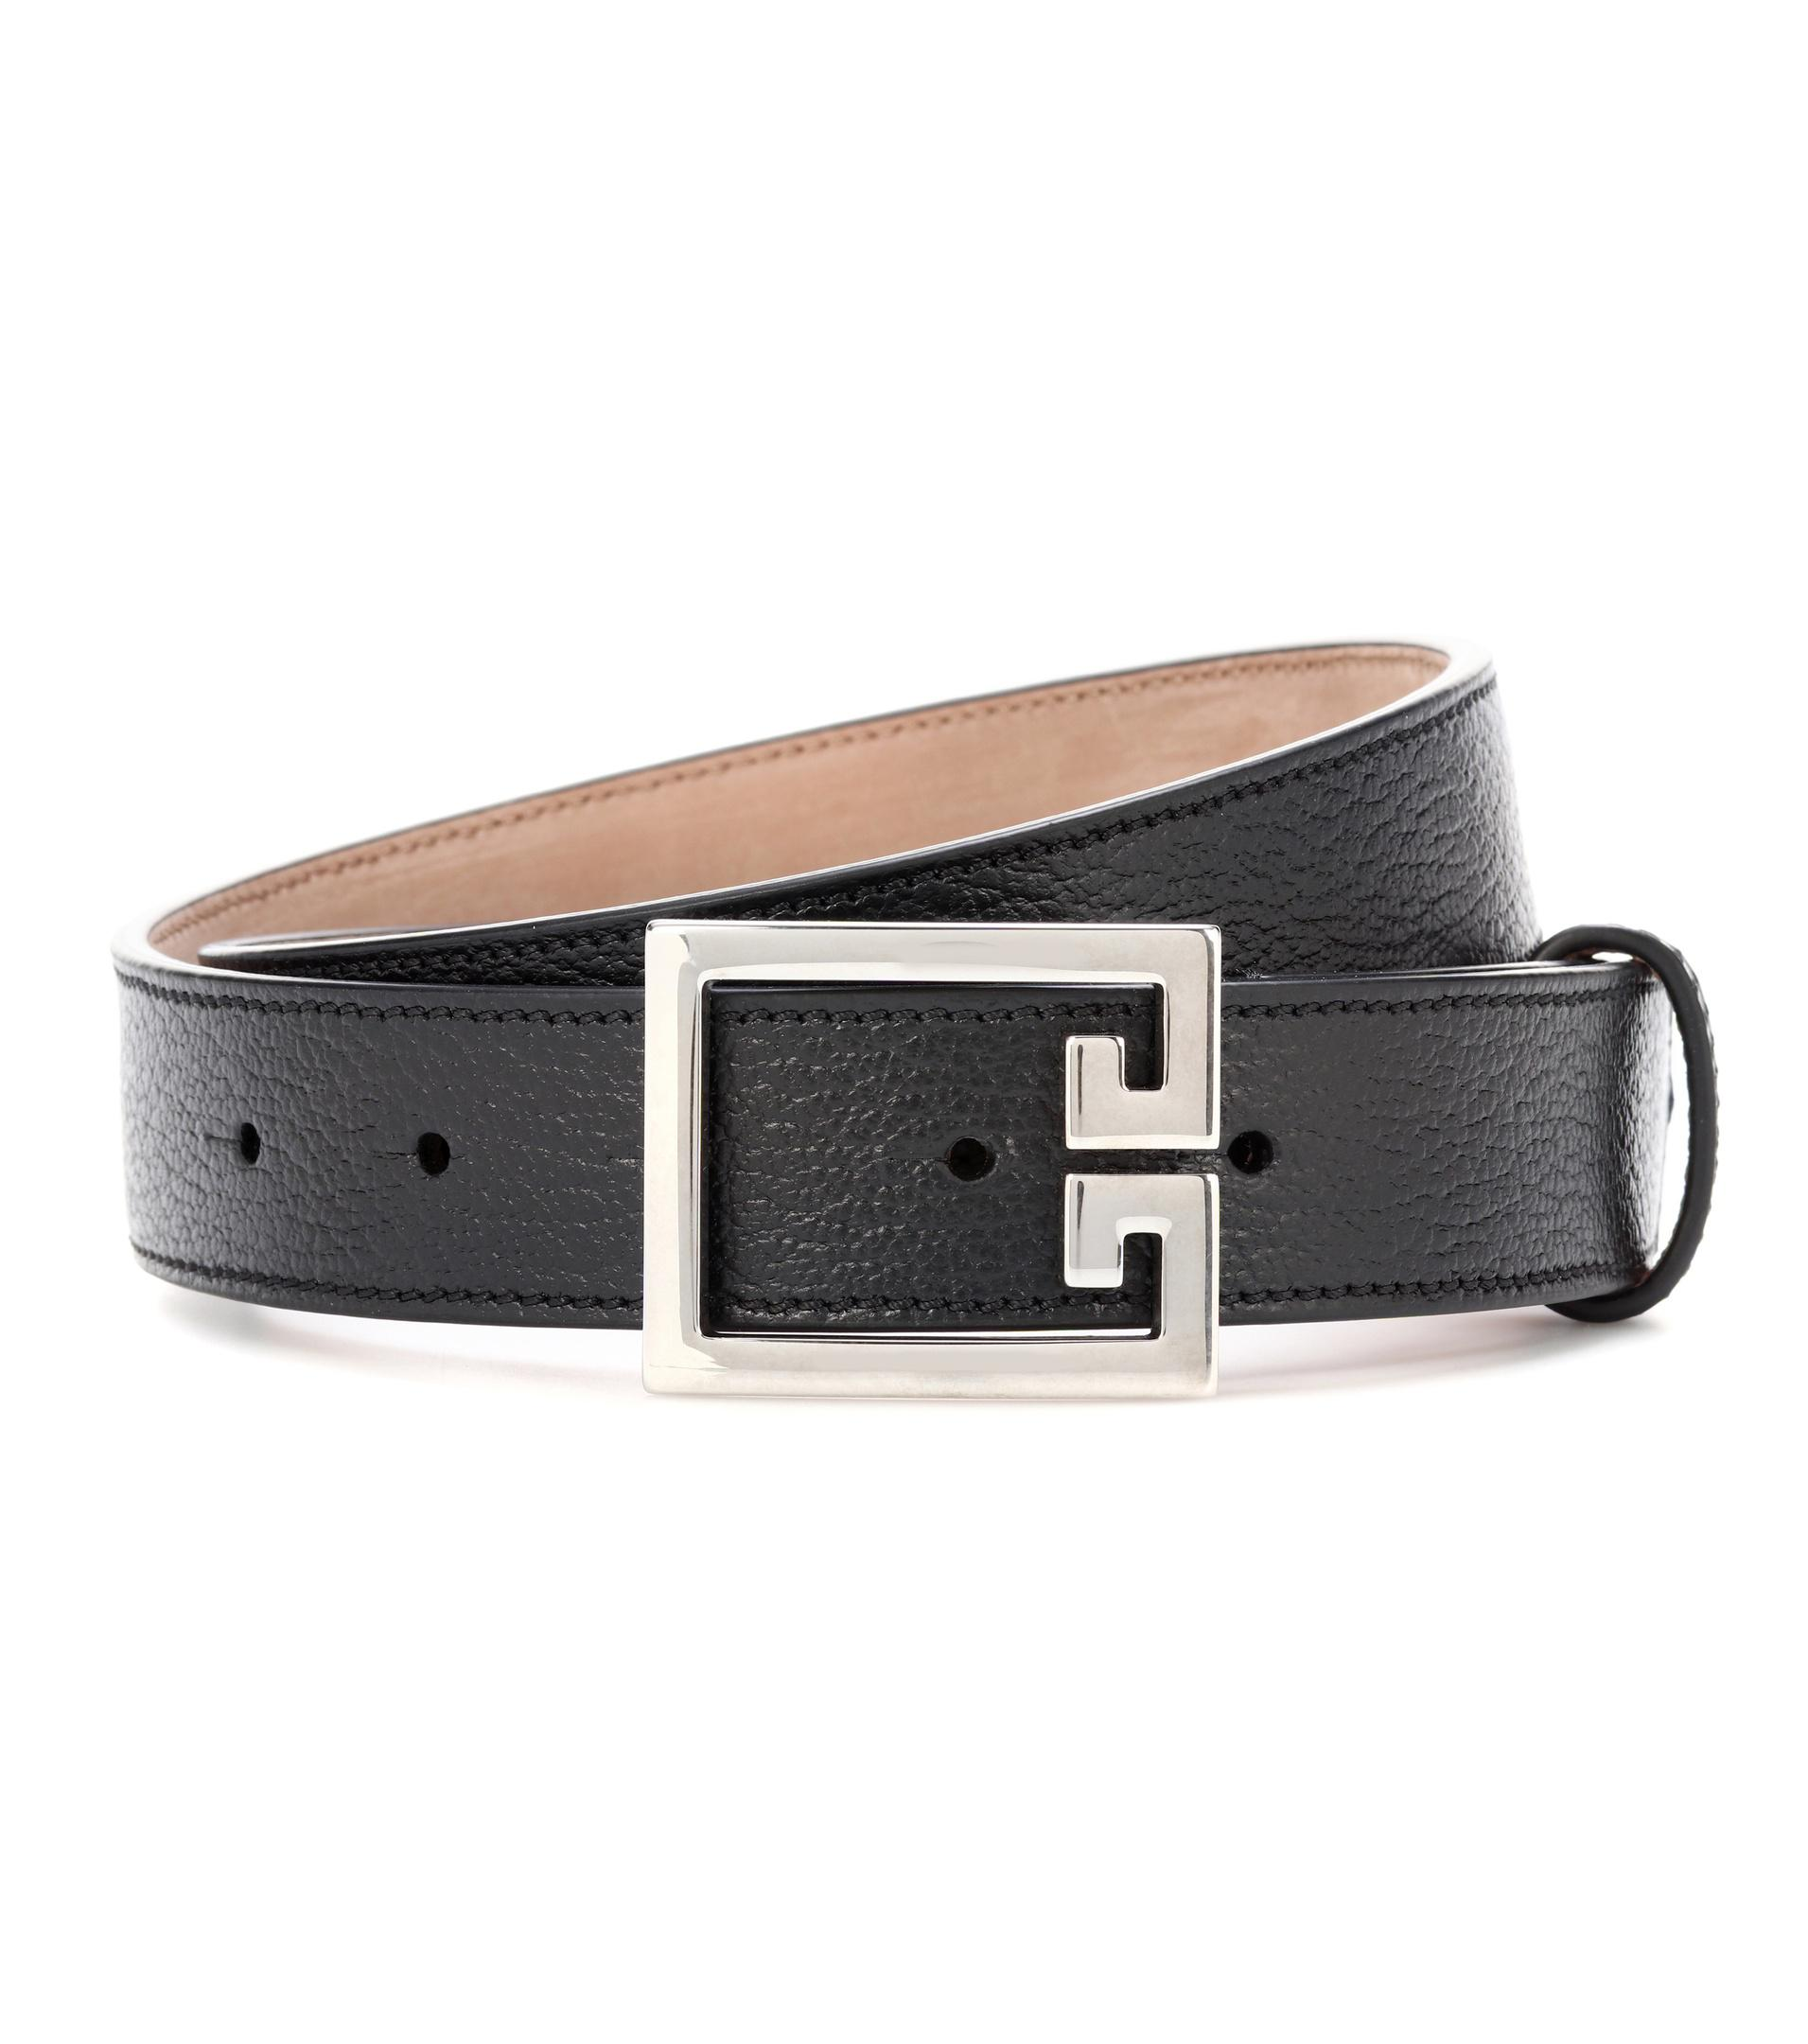 geometric buckle belt - Black Givenchy wXSxjwB52